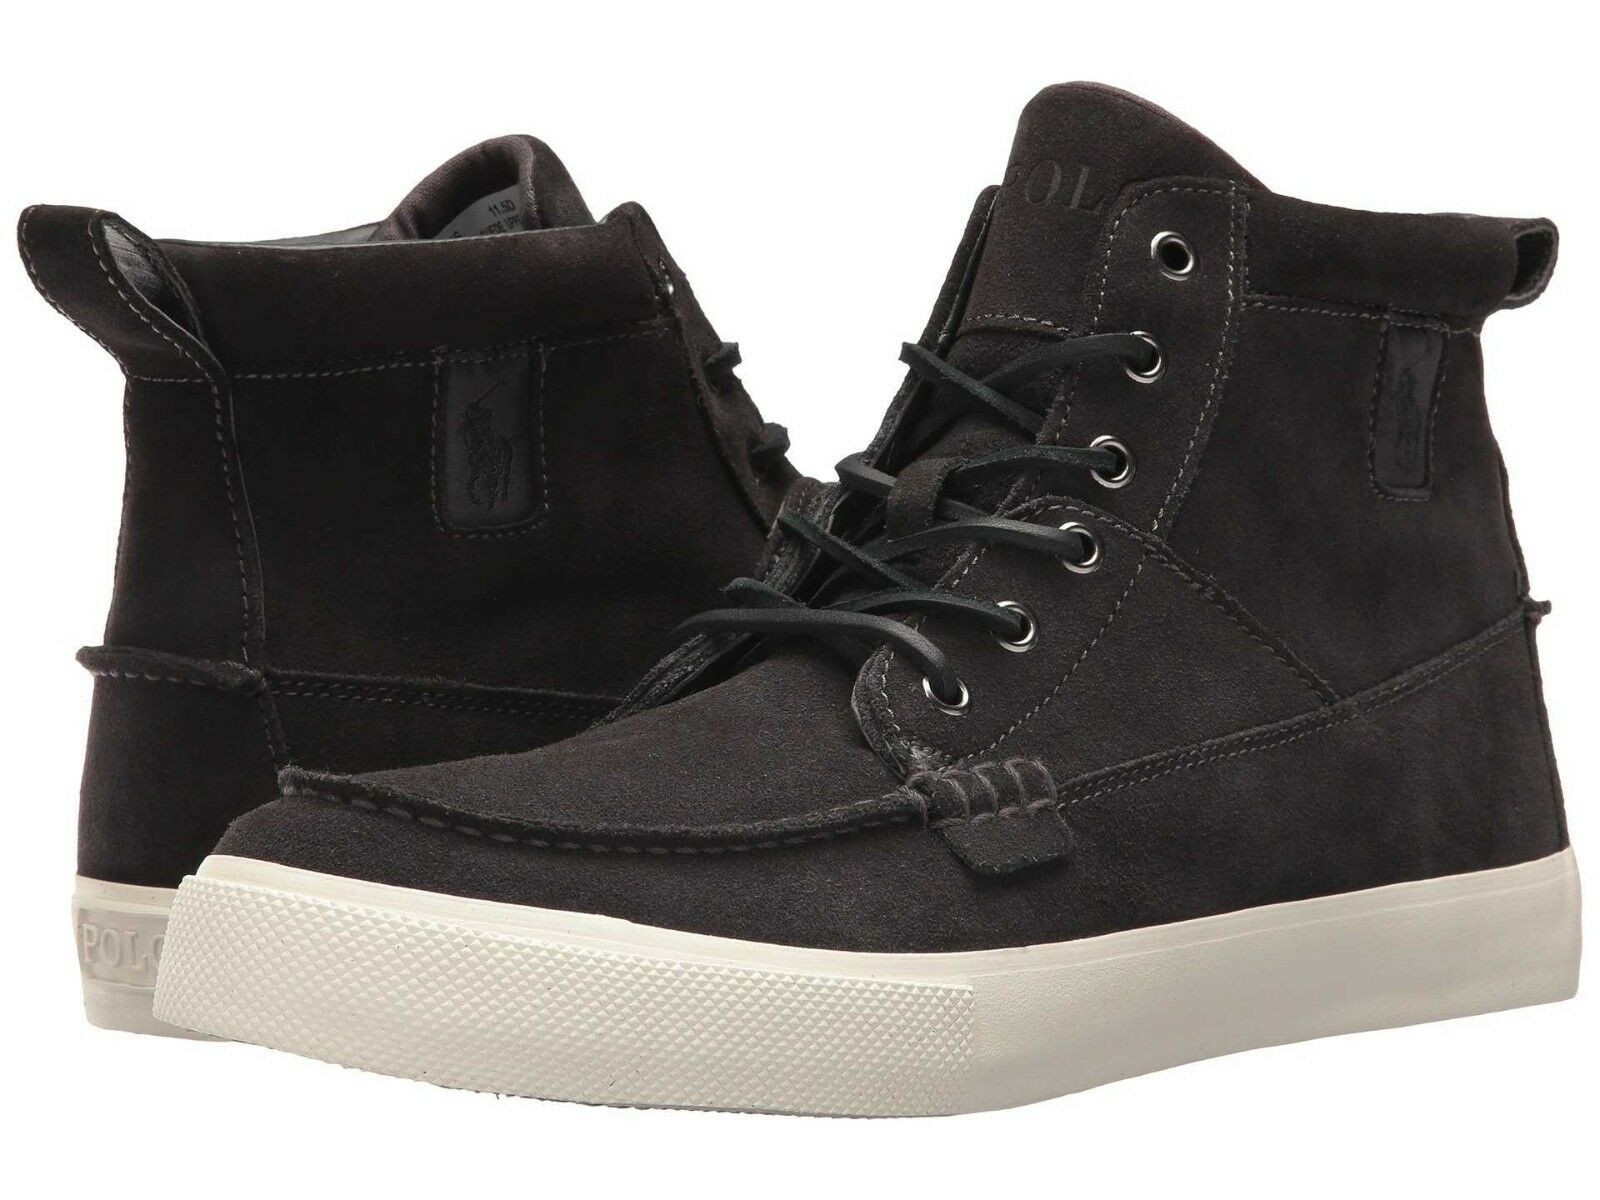 Senza tasse Polo Ralph Lauren Lauren Lauren Uomo Tavis-Sk-Vlc High Top leather scarpe da ginnastica stivali SZ  9  scelte con prezzo basso